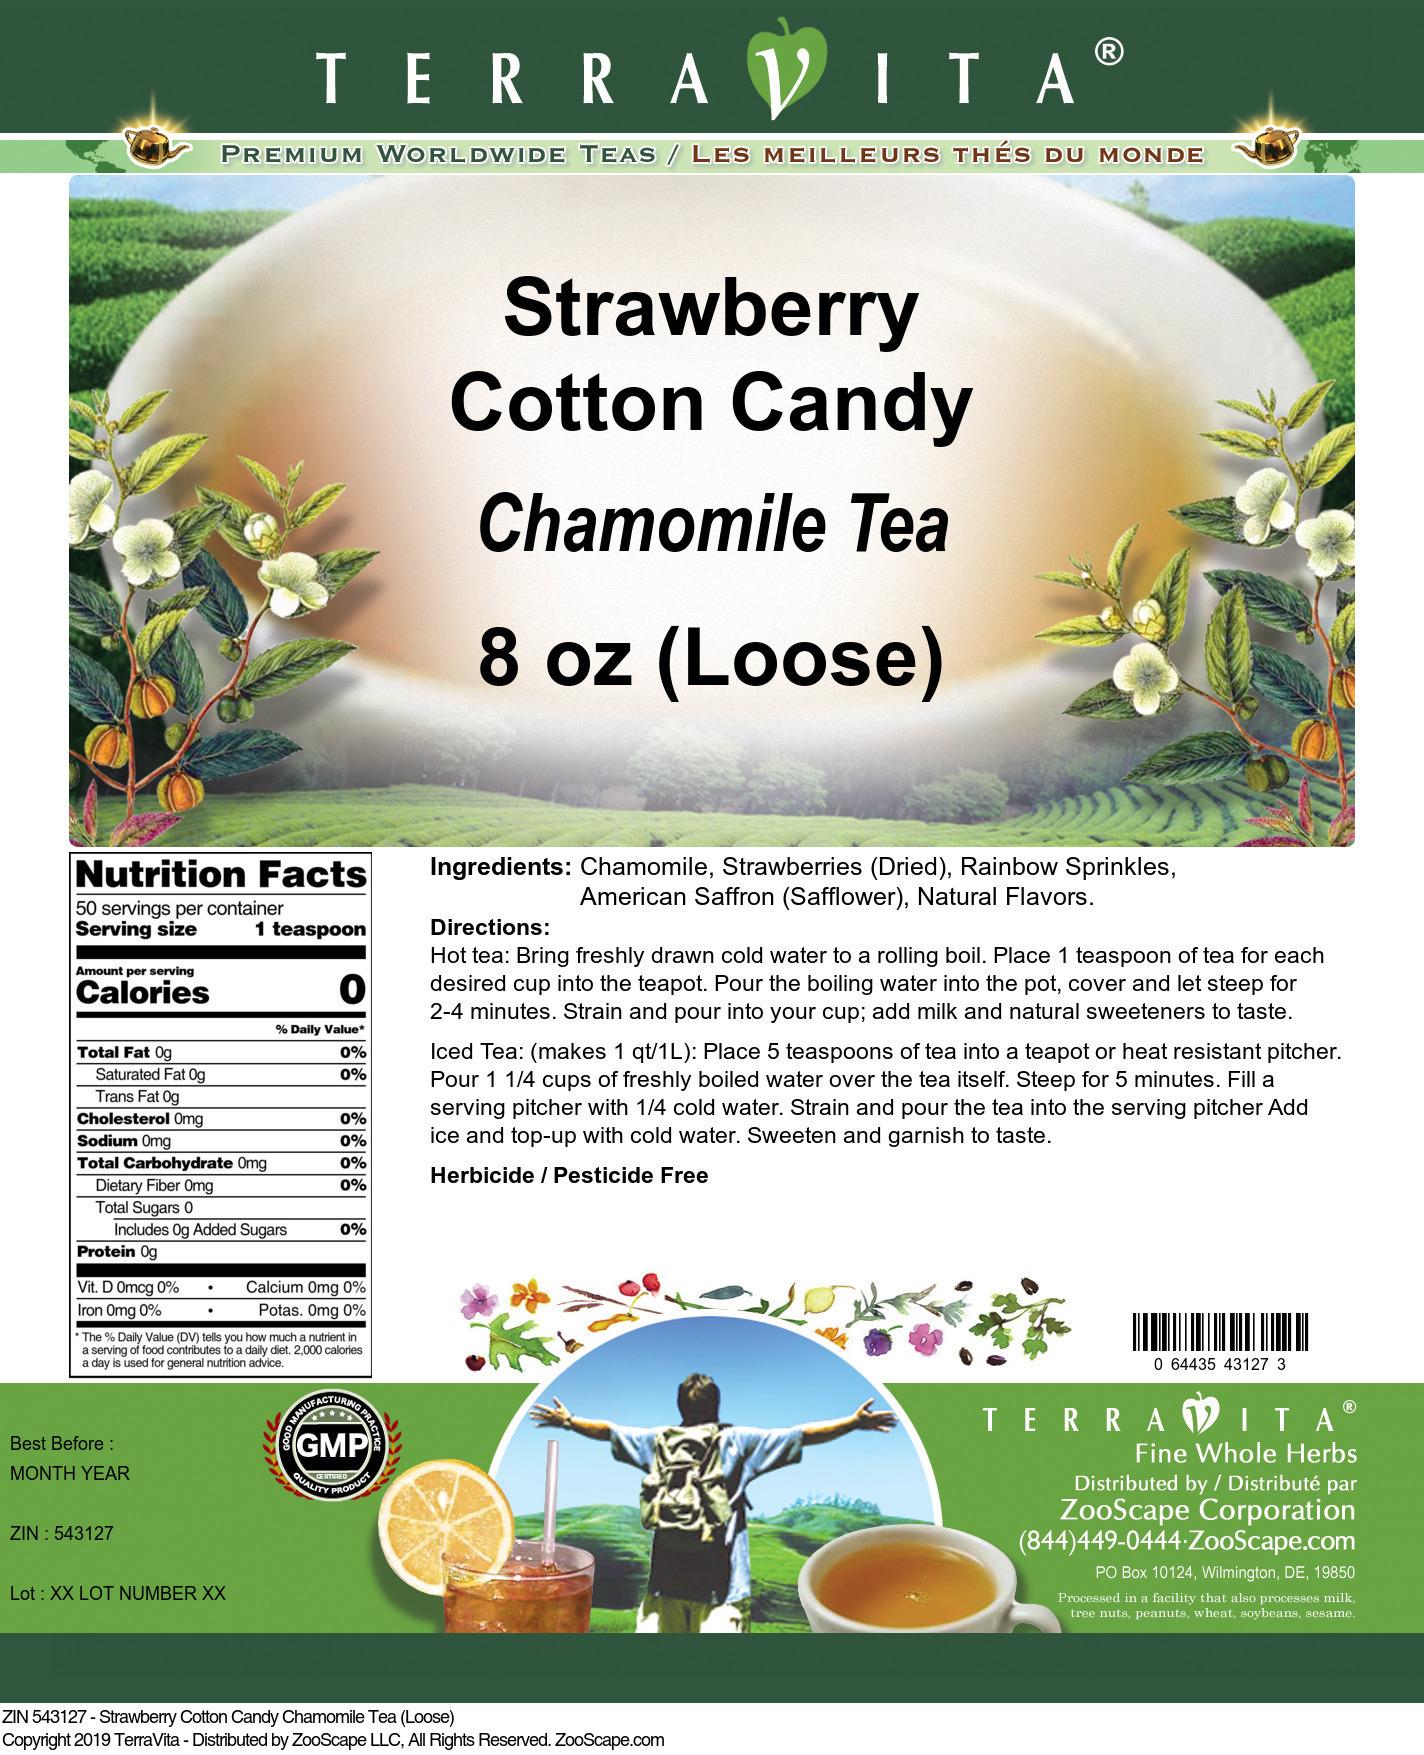 Strawberry Cotton Candy Chamomile Tea (Loose)